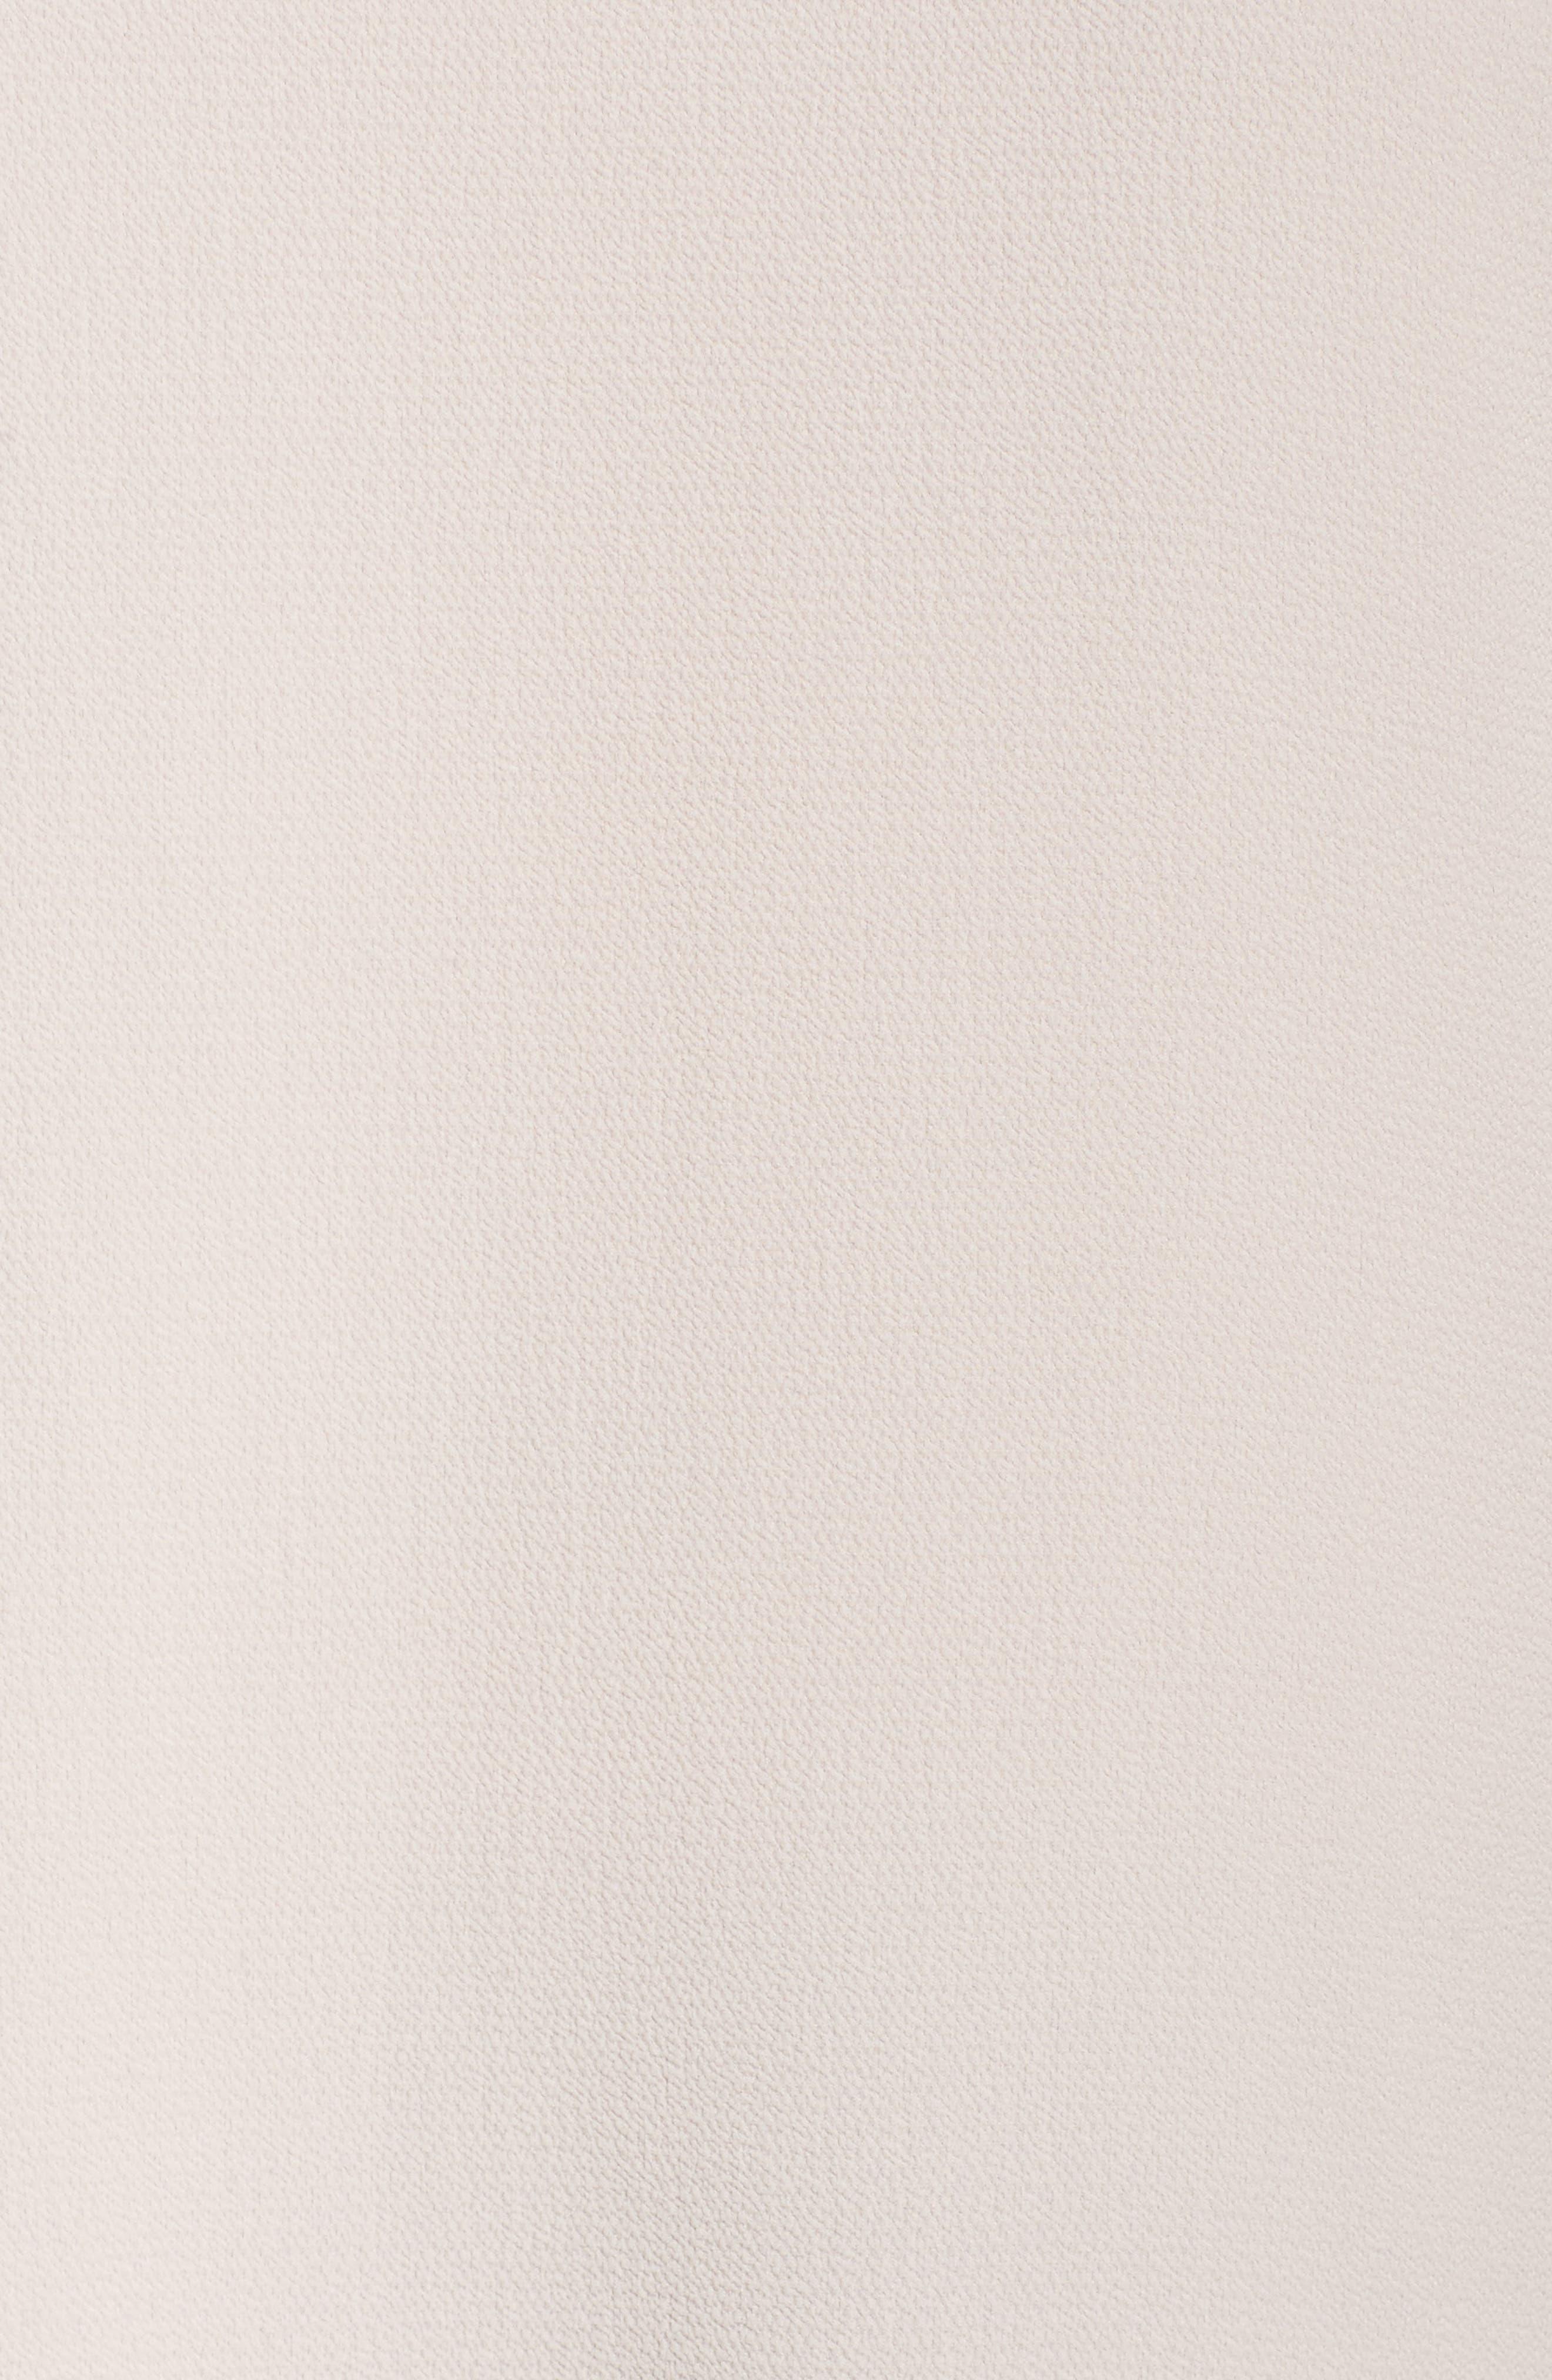 Bell Sleeve Blouse,                             Alternate thumbnail 23, color,